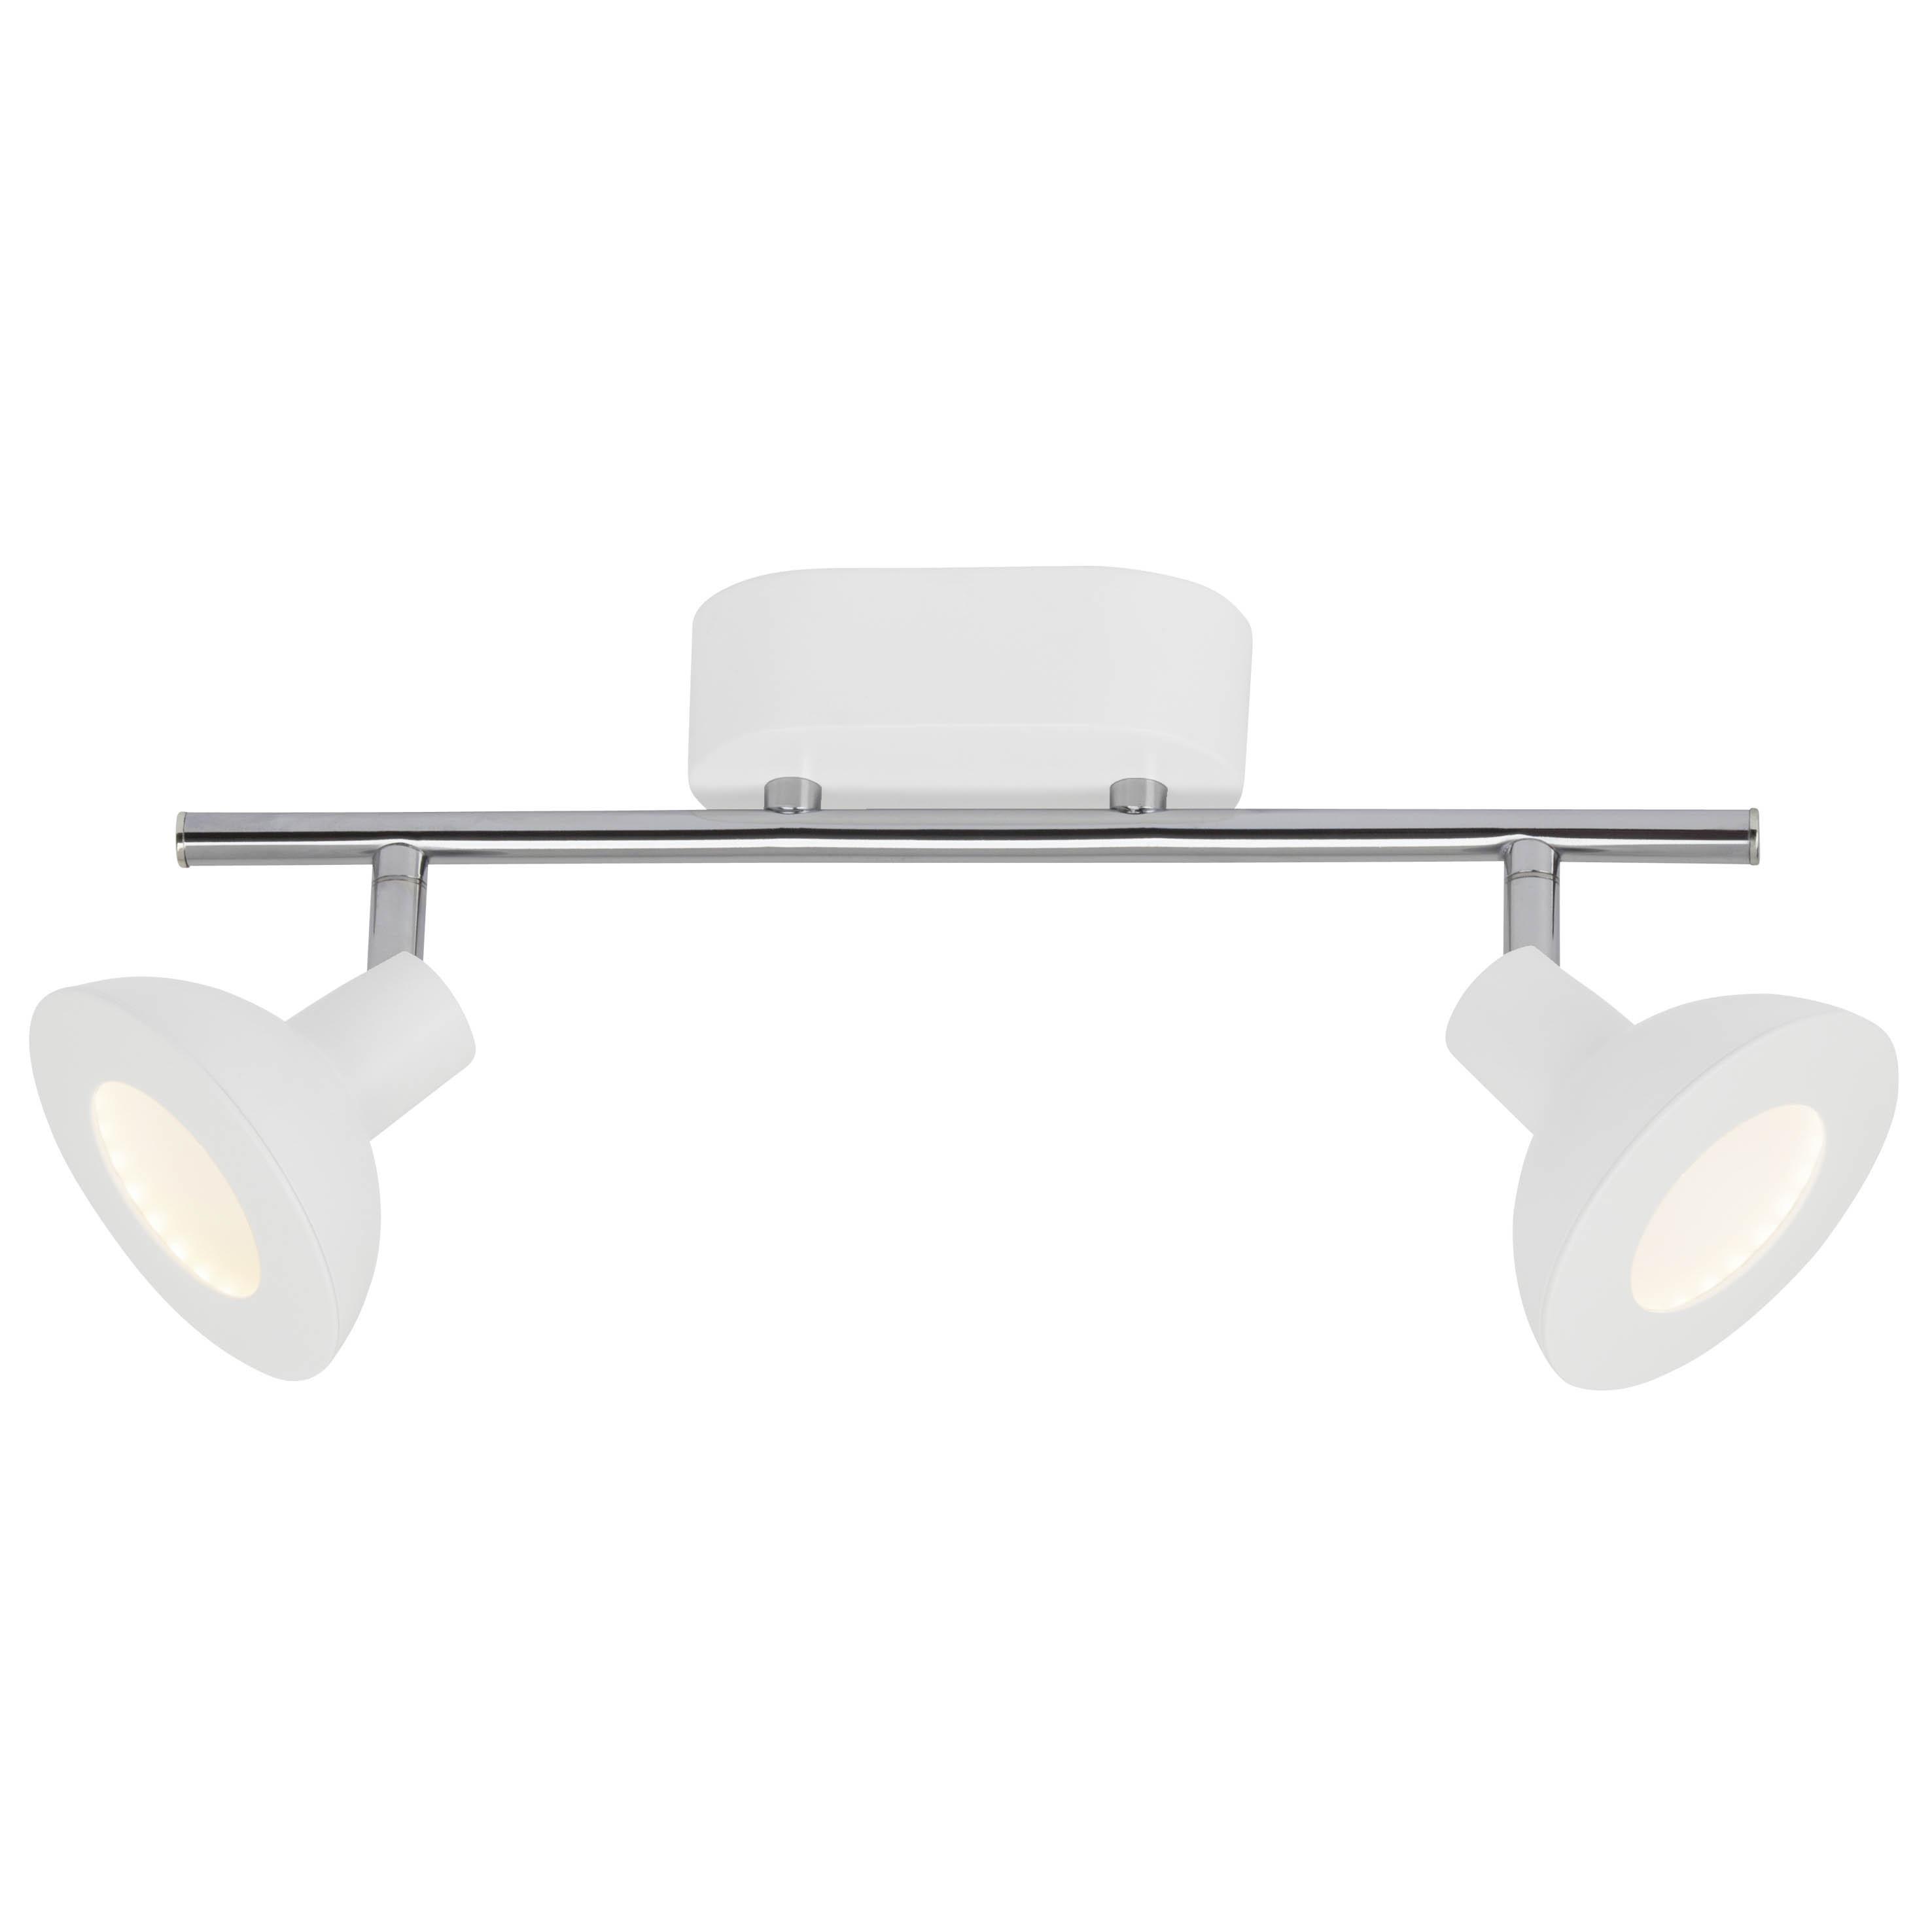 AEG Titania LED Spotrohr 2flg weiß/chrom